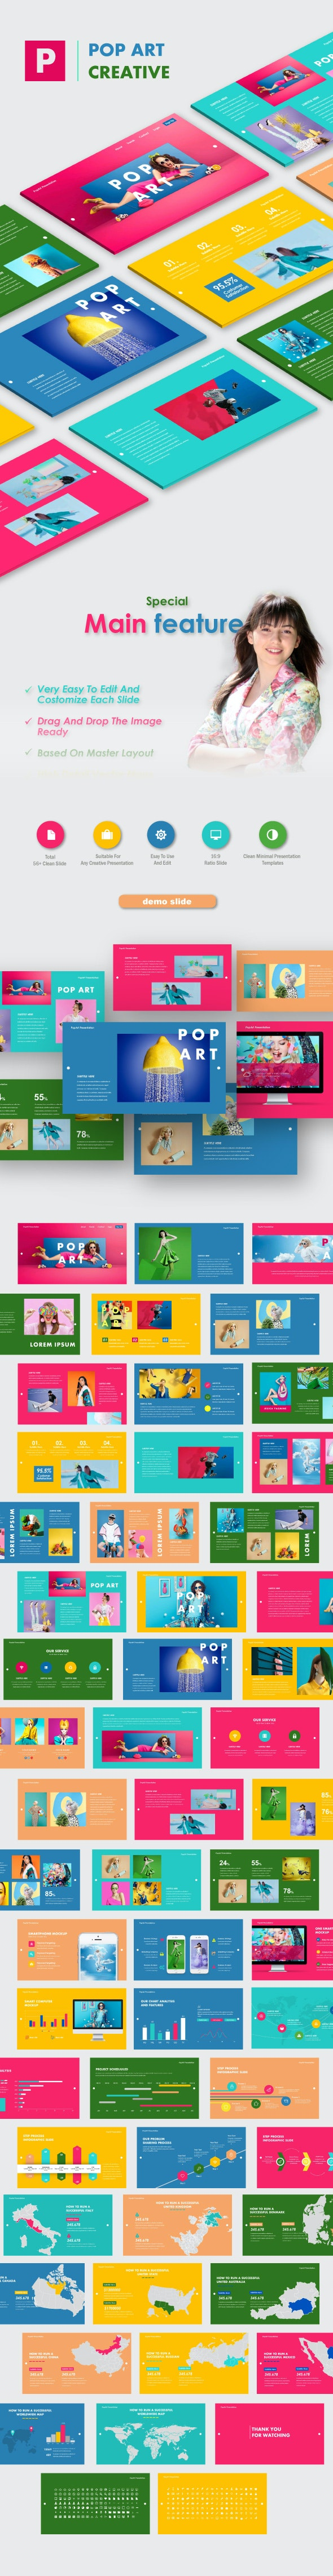 Pop Art Creative Google Slide Templates - Google Slides Presentation Templates